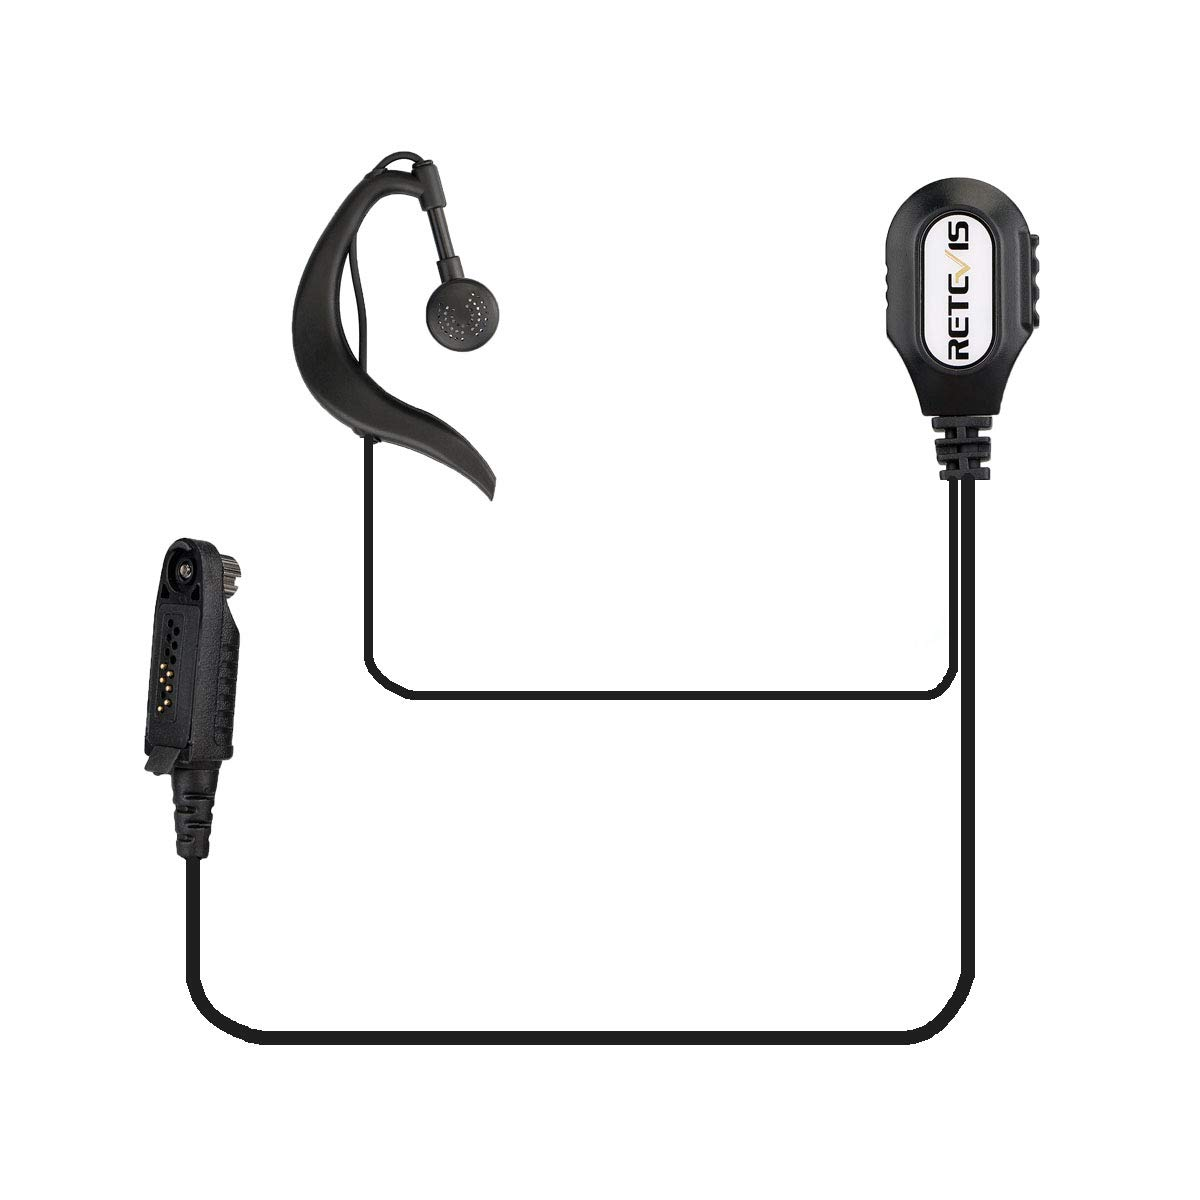 Negro, 1 Pack Retevis Auricular G-forma Pinganillo para Walkie Talkie Retevis RT82 RT87 DMR Radio Walkie Talkies